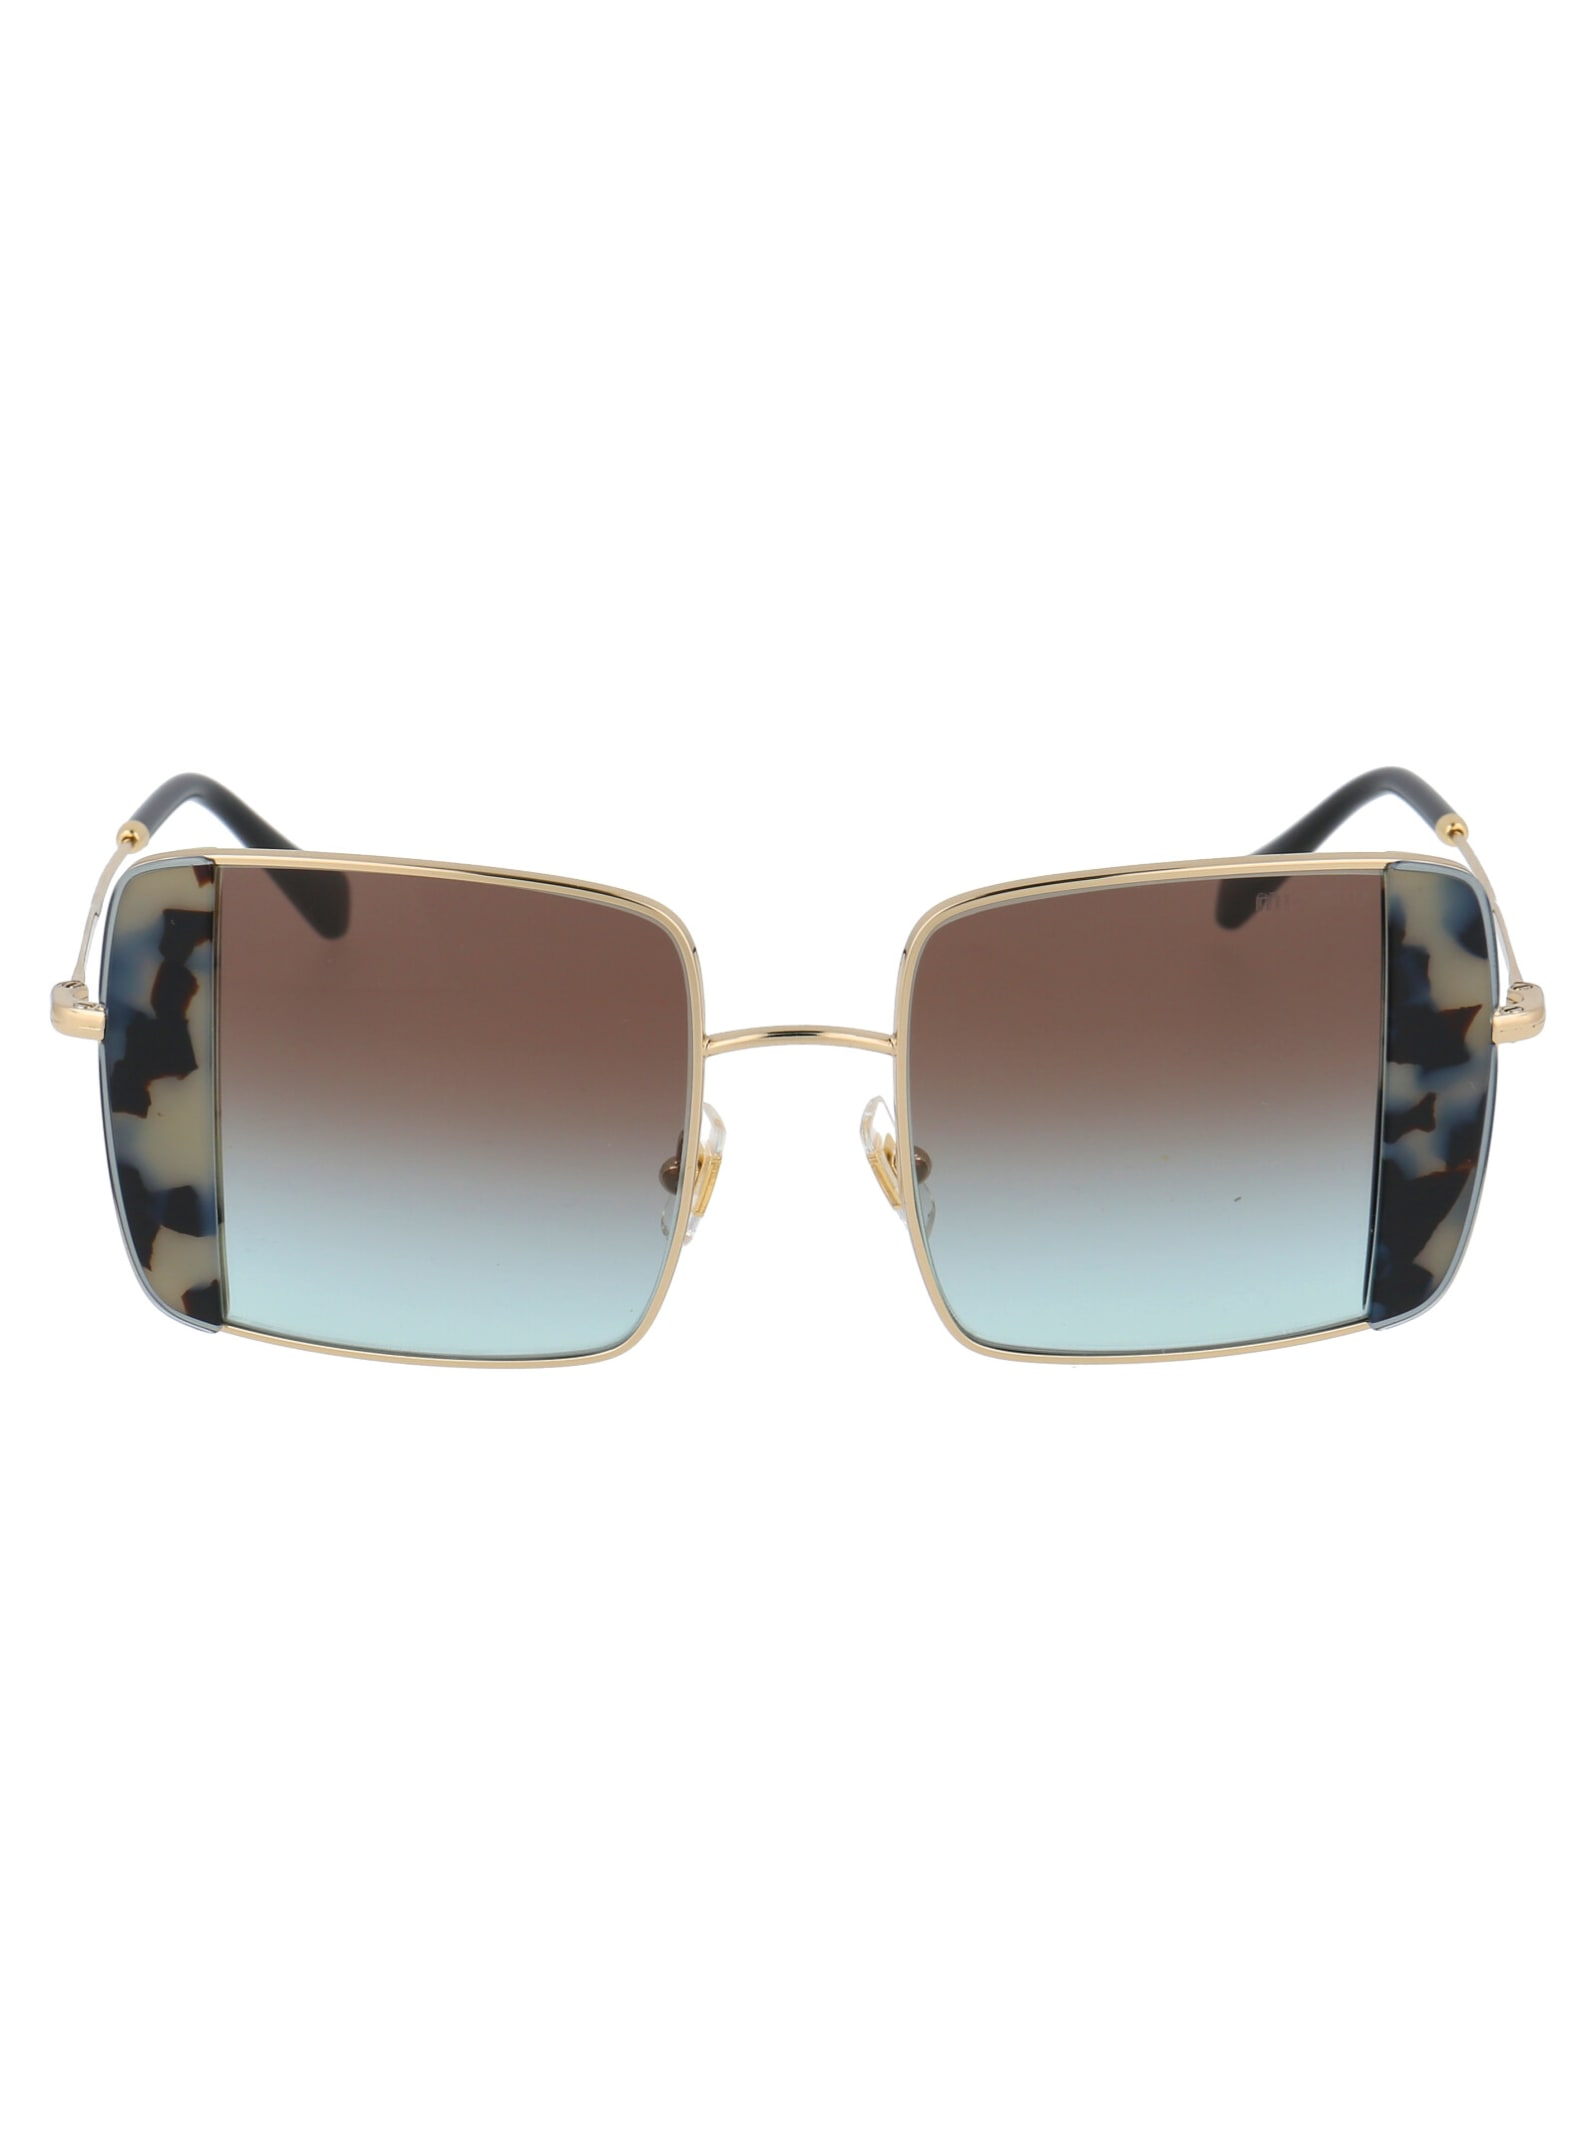 0mu 56vs Sunglasses